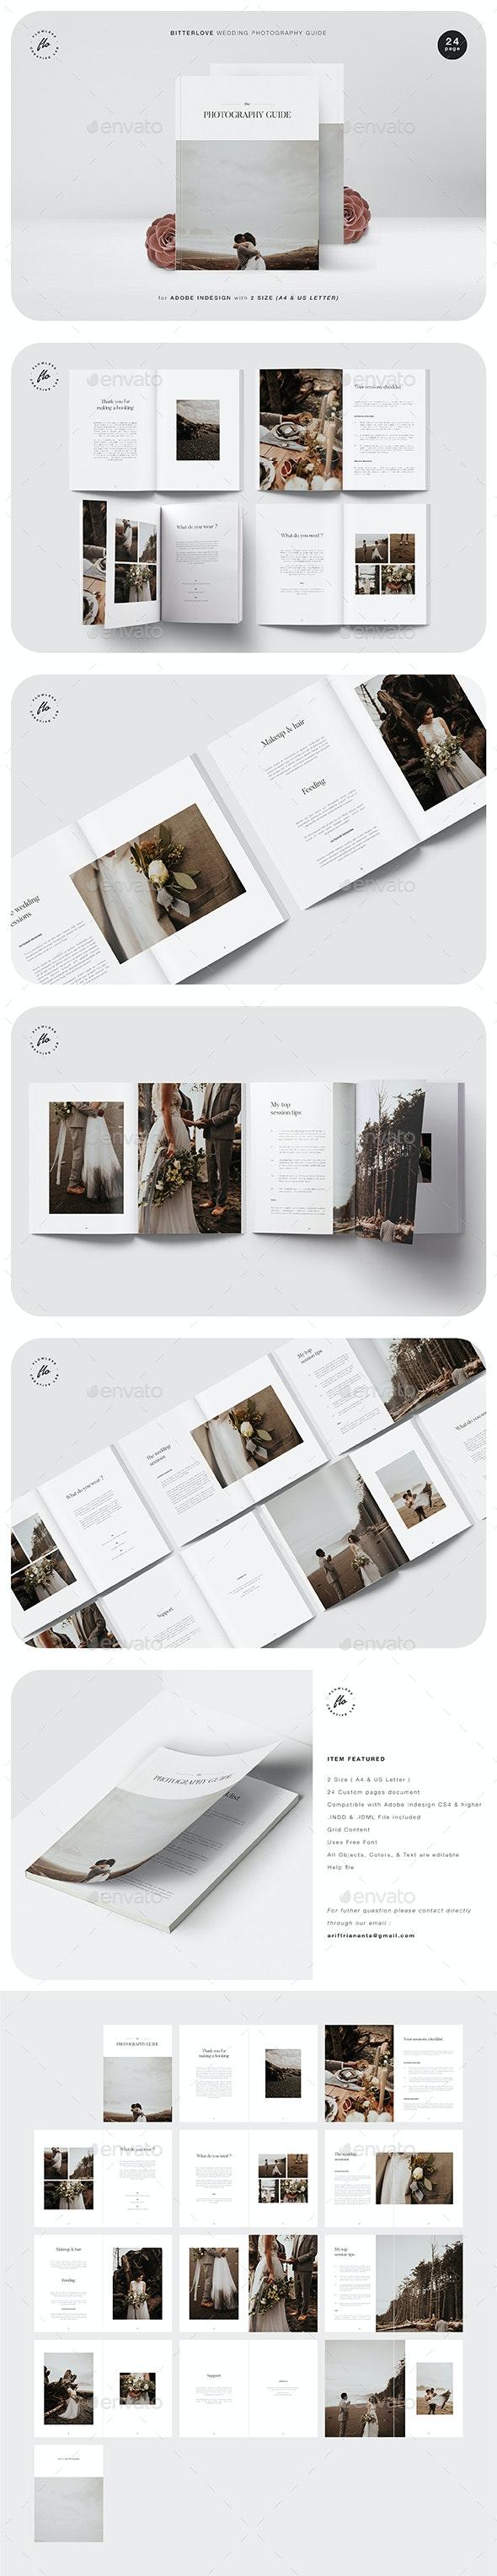 Bitterlove Wedding Photography Guide - Magazines Print Templates